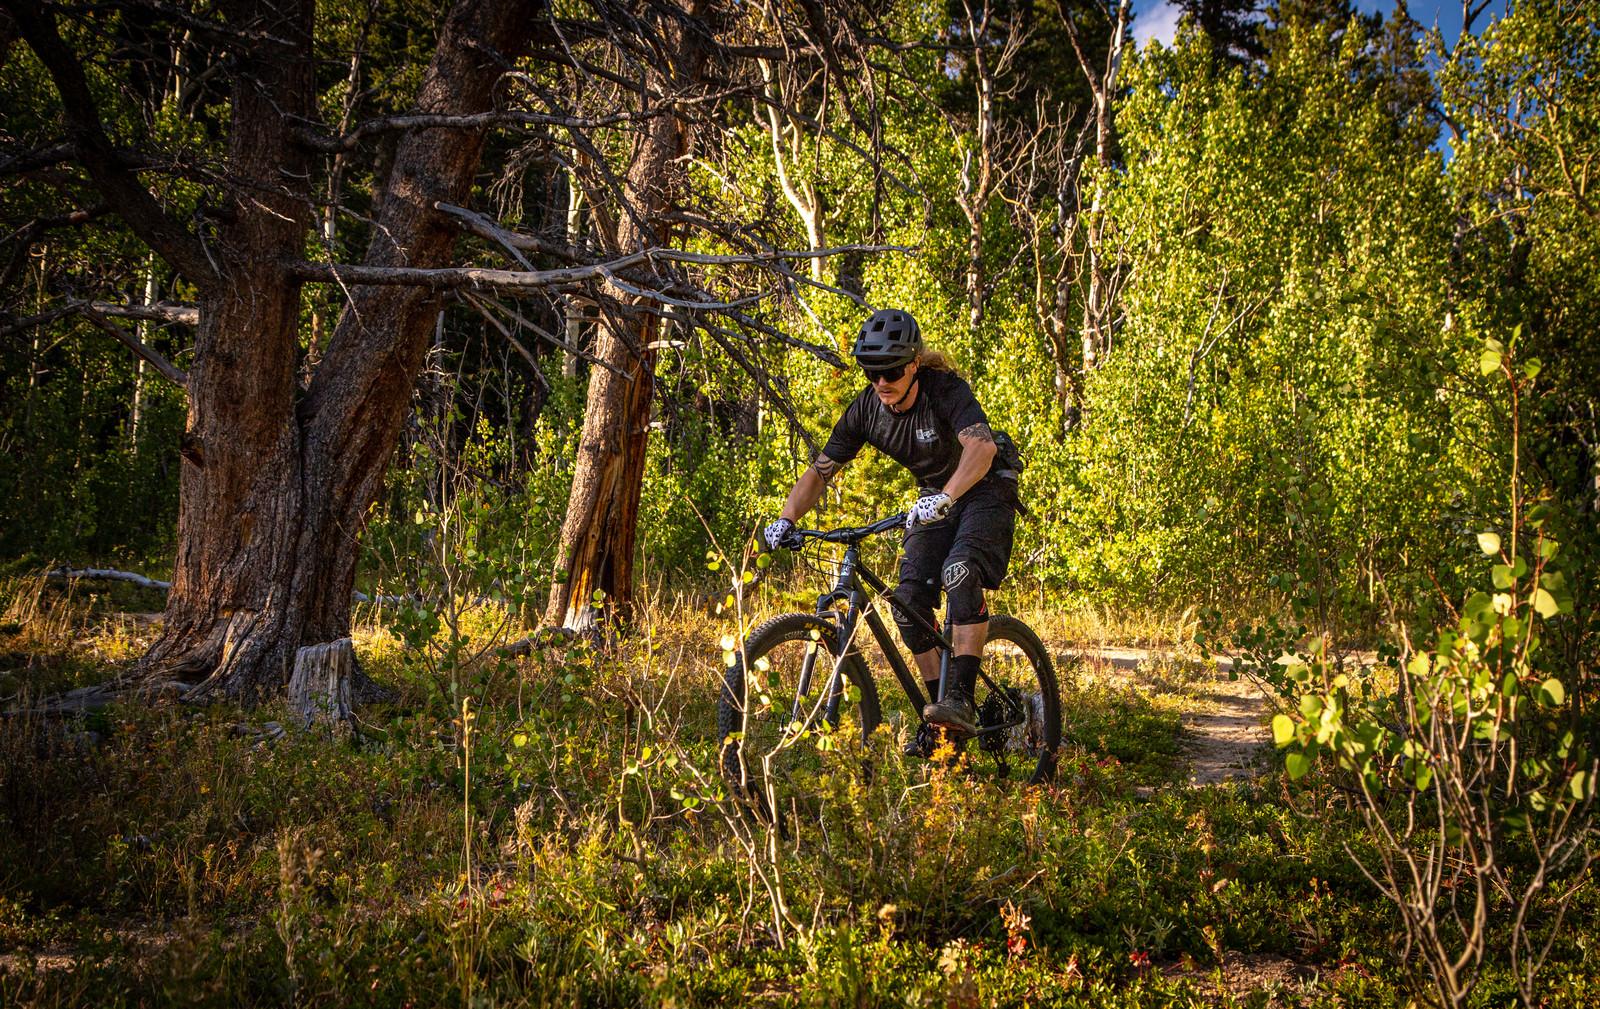 GG Rider, Eric Bodine, on the revamped Pedalhead